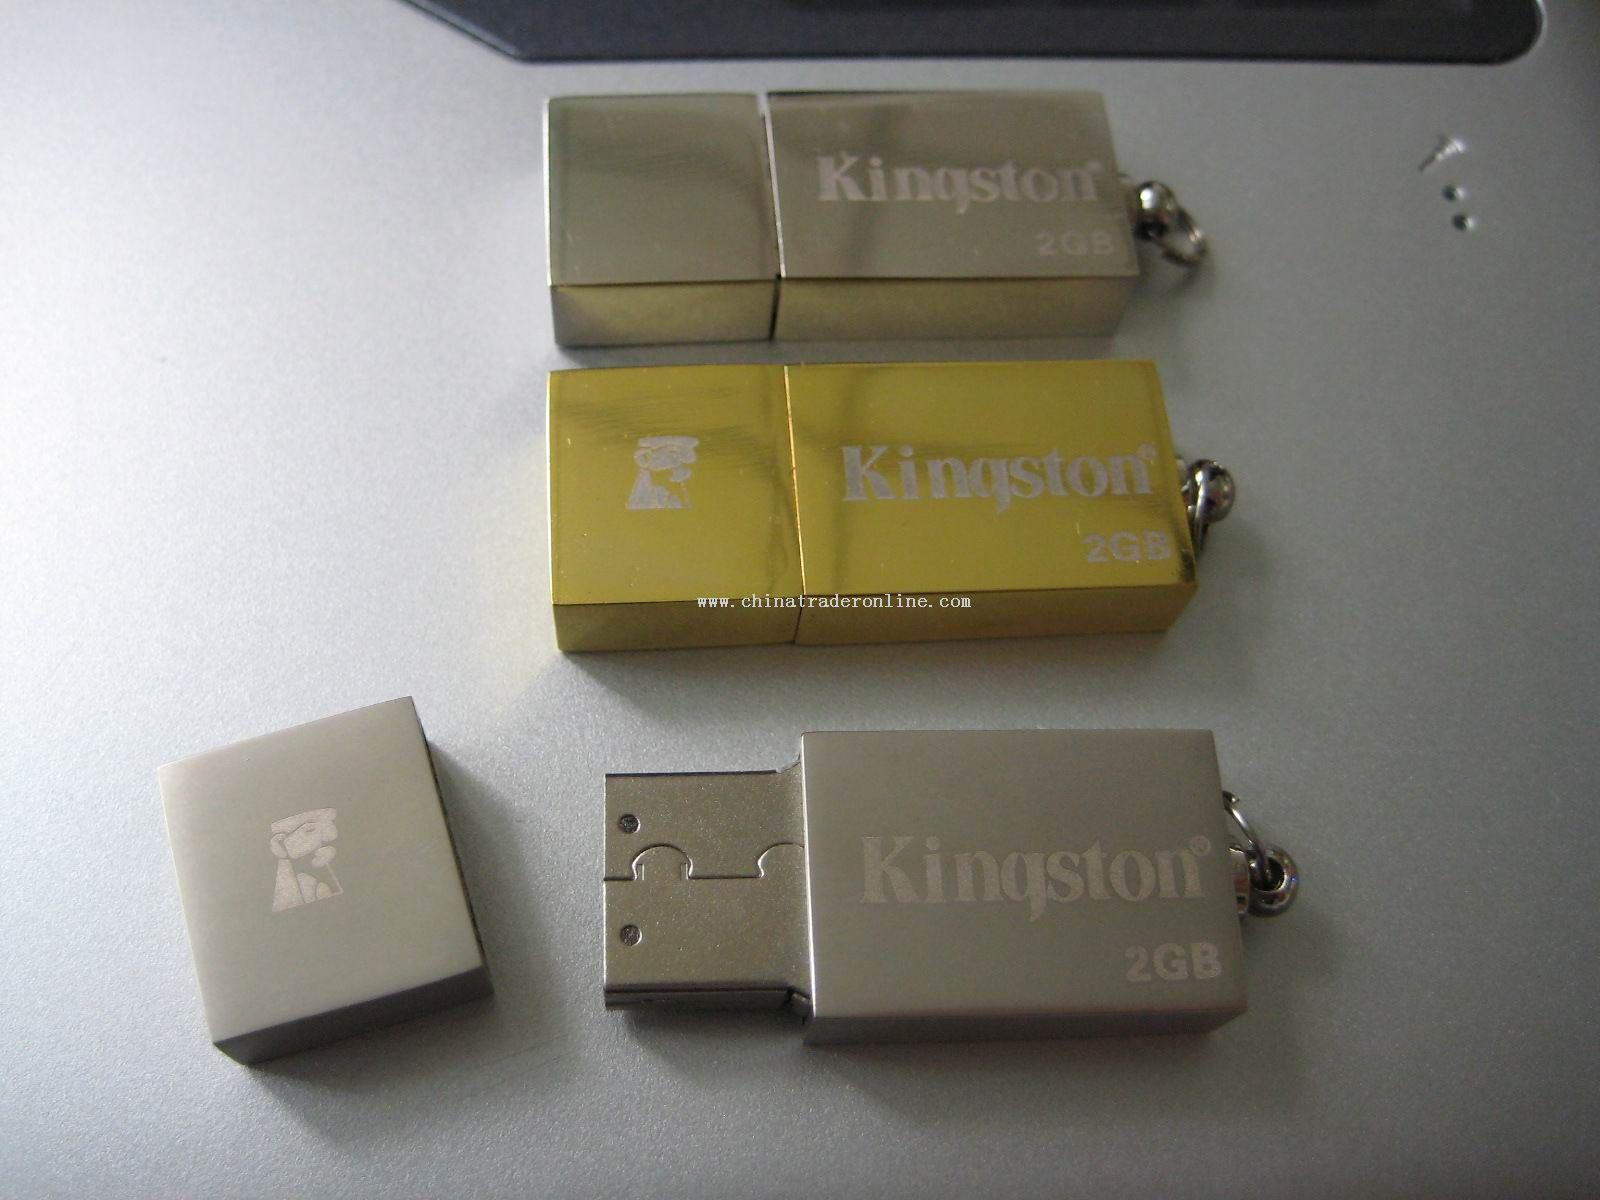 Metal usb flash drive from China